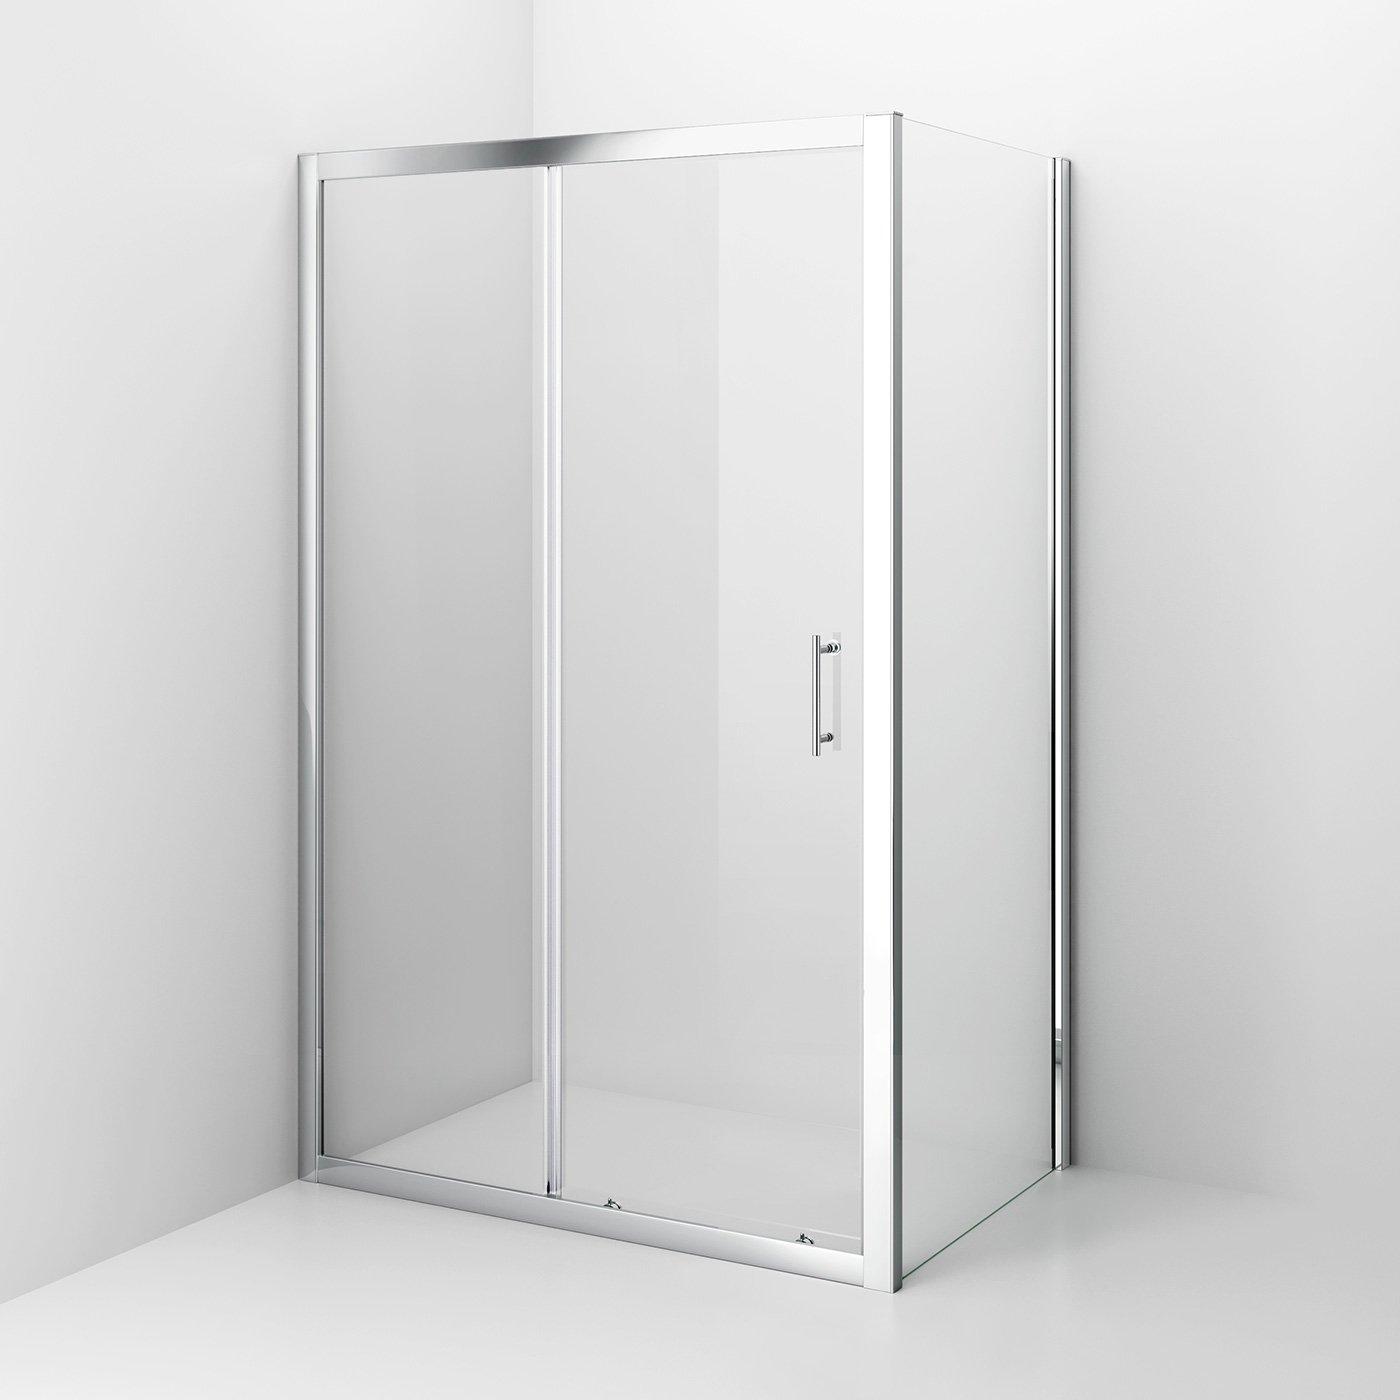 iBathUK 1200 x 800 Modern Sliding 6mm Glass Shower Enclosure Cubicle ...